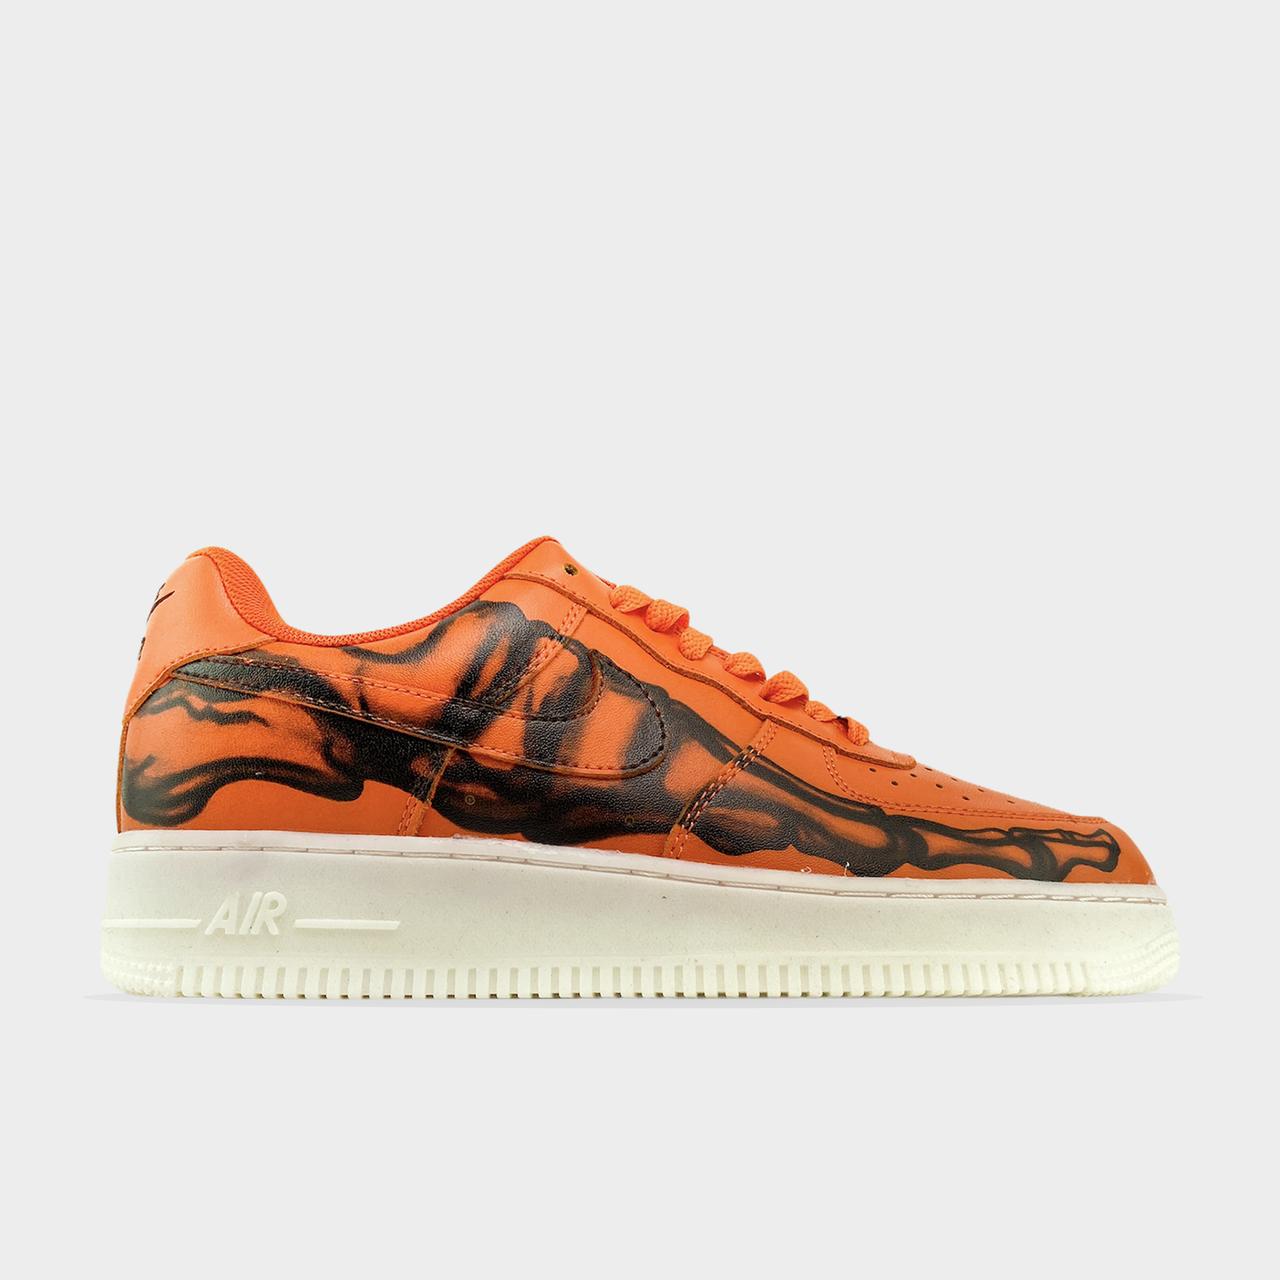 Nk, крос, обувь, взуття, sneakers, шузы, Air Force 1 Low Skeleton Orange (Оранжевый)